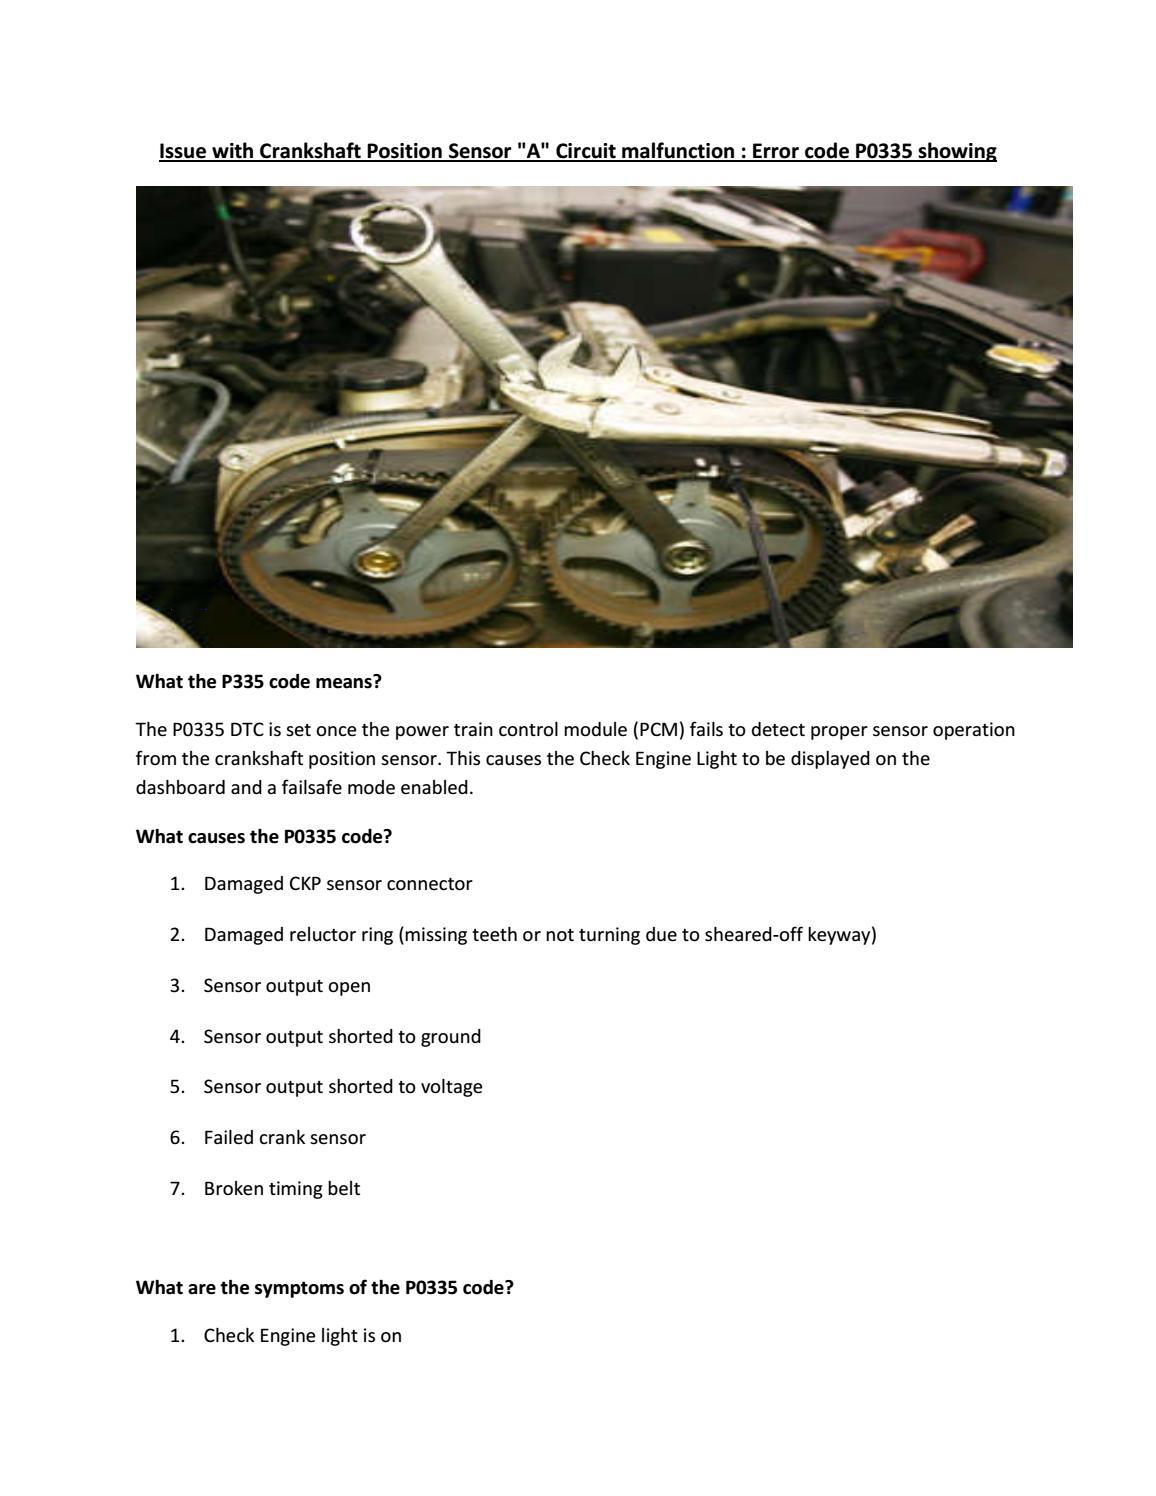 Partsavatar Car Parts, Toronto - Issue with Crankshaft